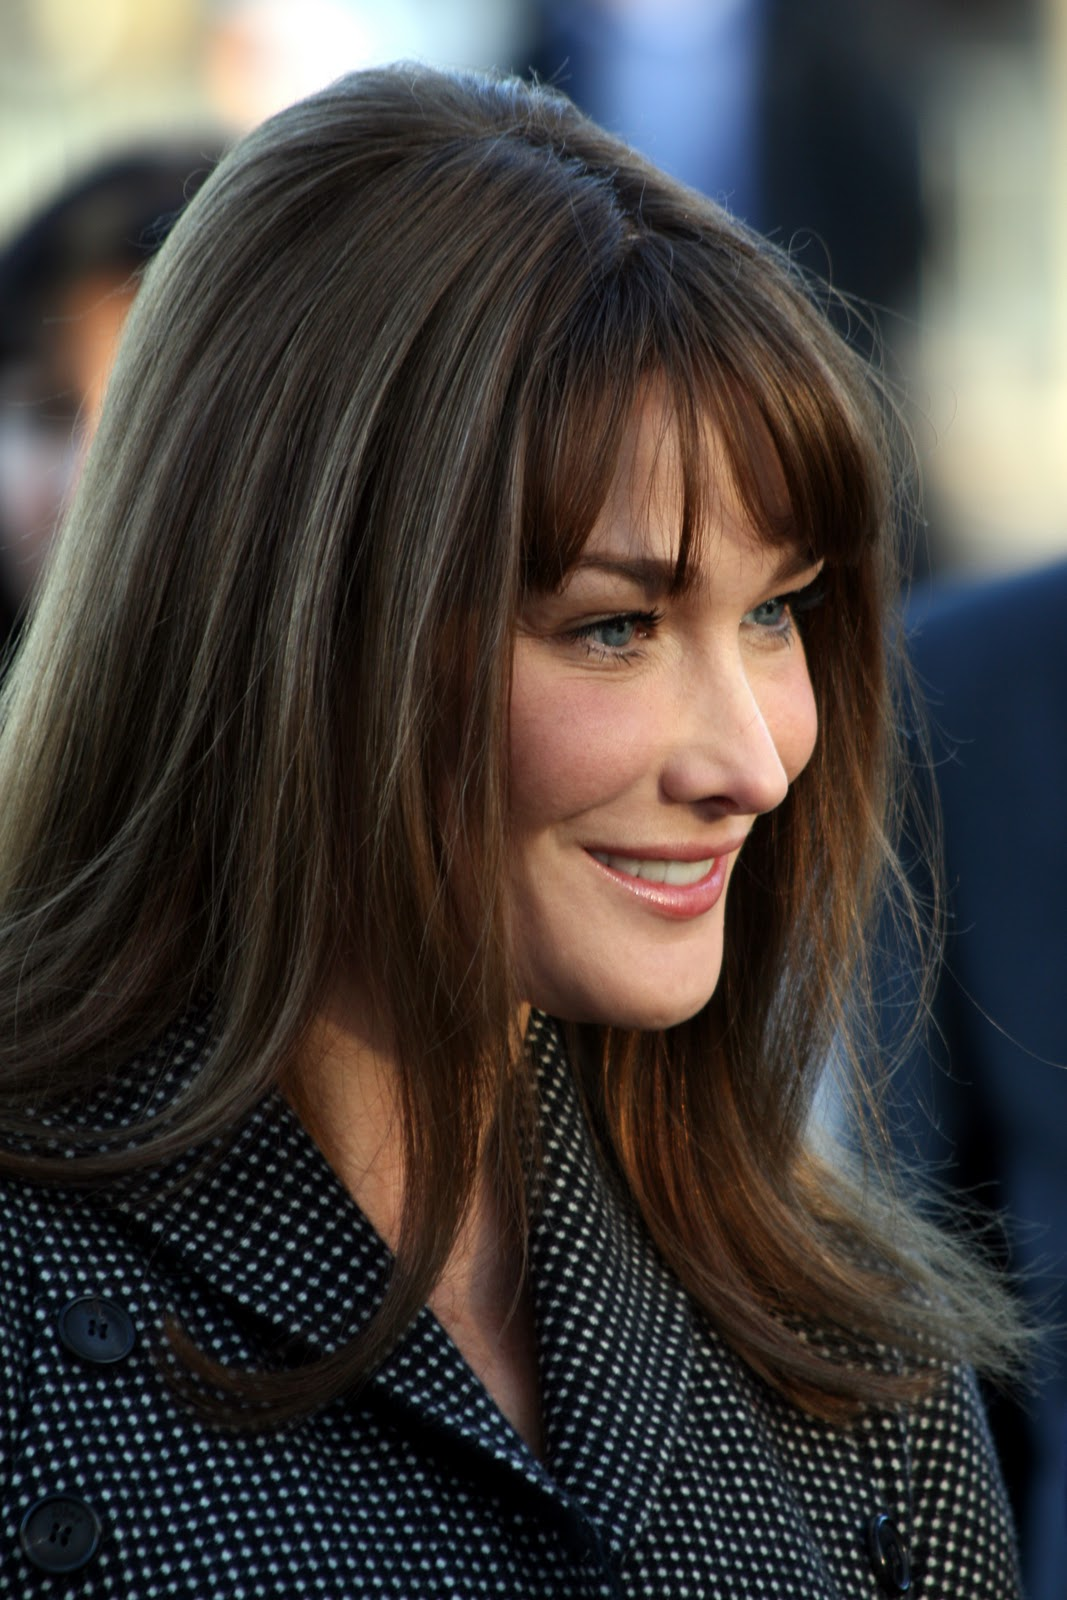 http://2.bp.blogspot.com/_Z9f1x4ajlb0/TRpBpU4zewI/AAAAAAAAAIk/hg2sUeDp5O0/s1600/Carla_Bruni-Sarkozy_%25283%2529.jpg